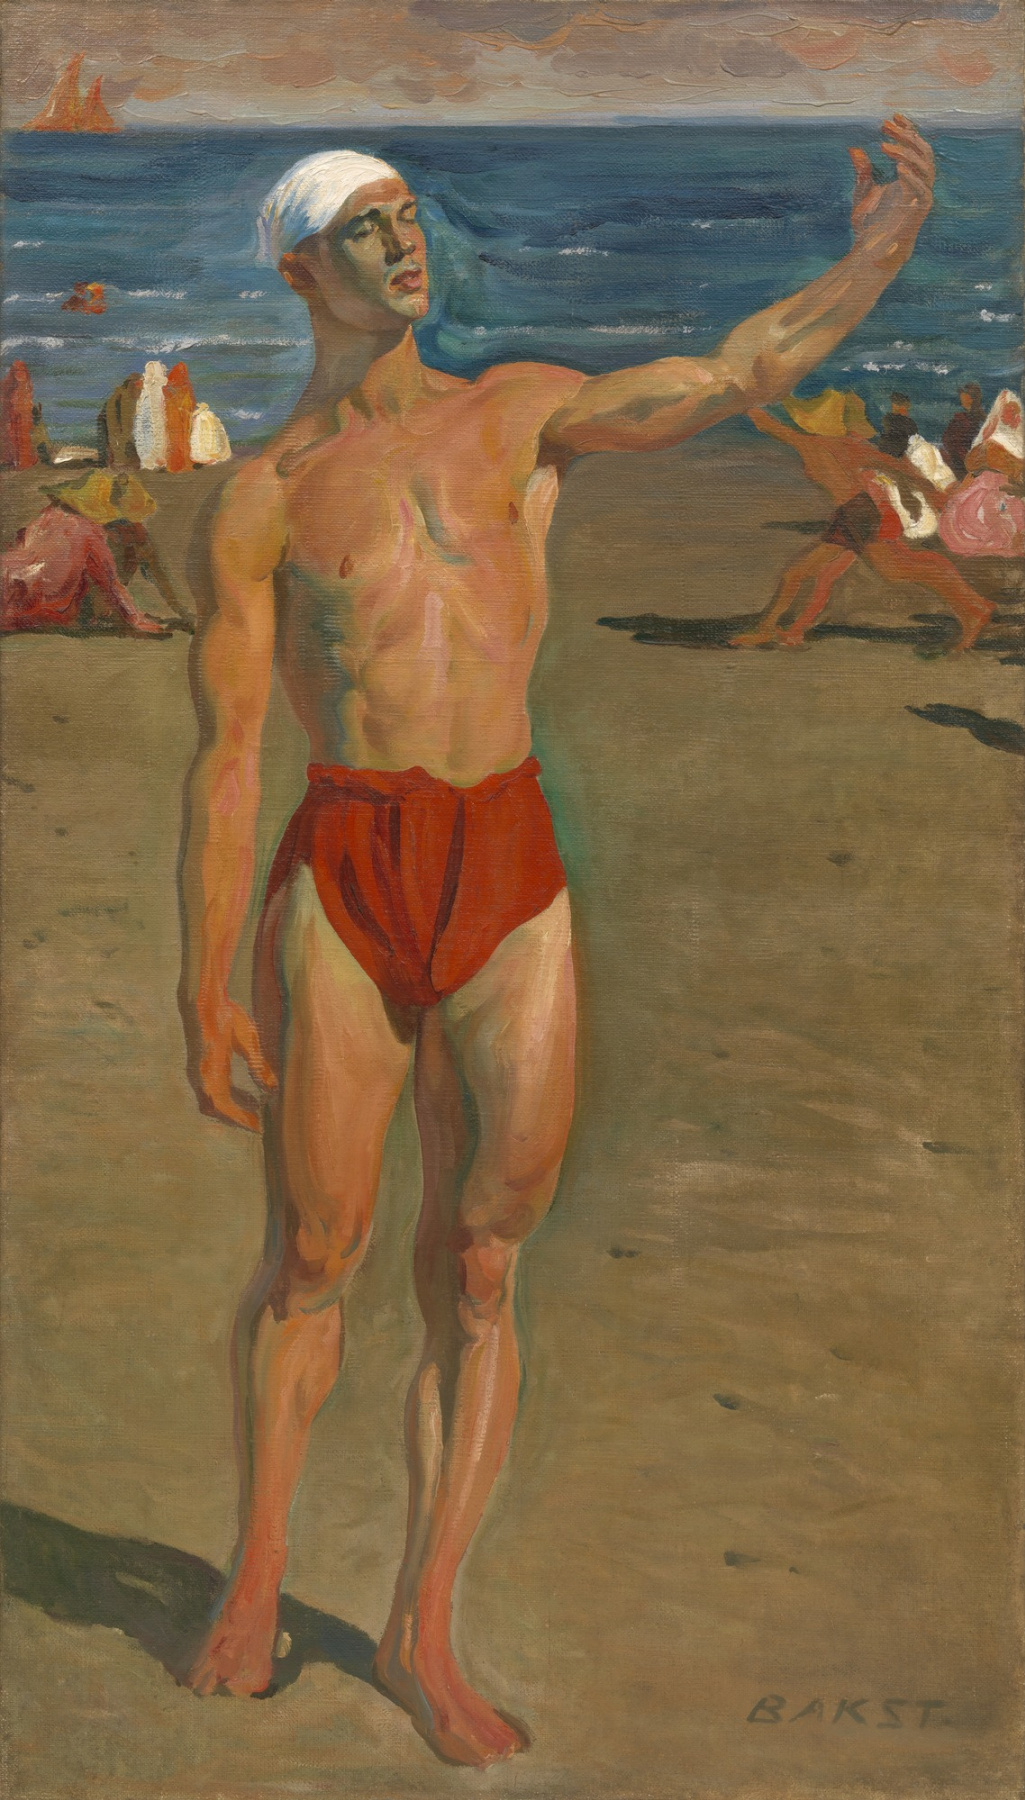 Lev Samoilovich Bakst (Leon Bakst). Vaslav Nijinsky